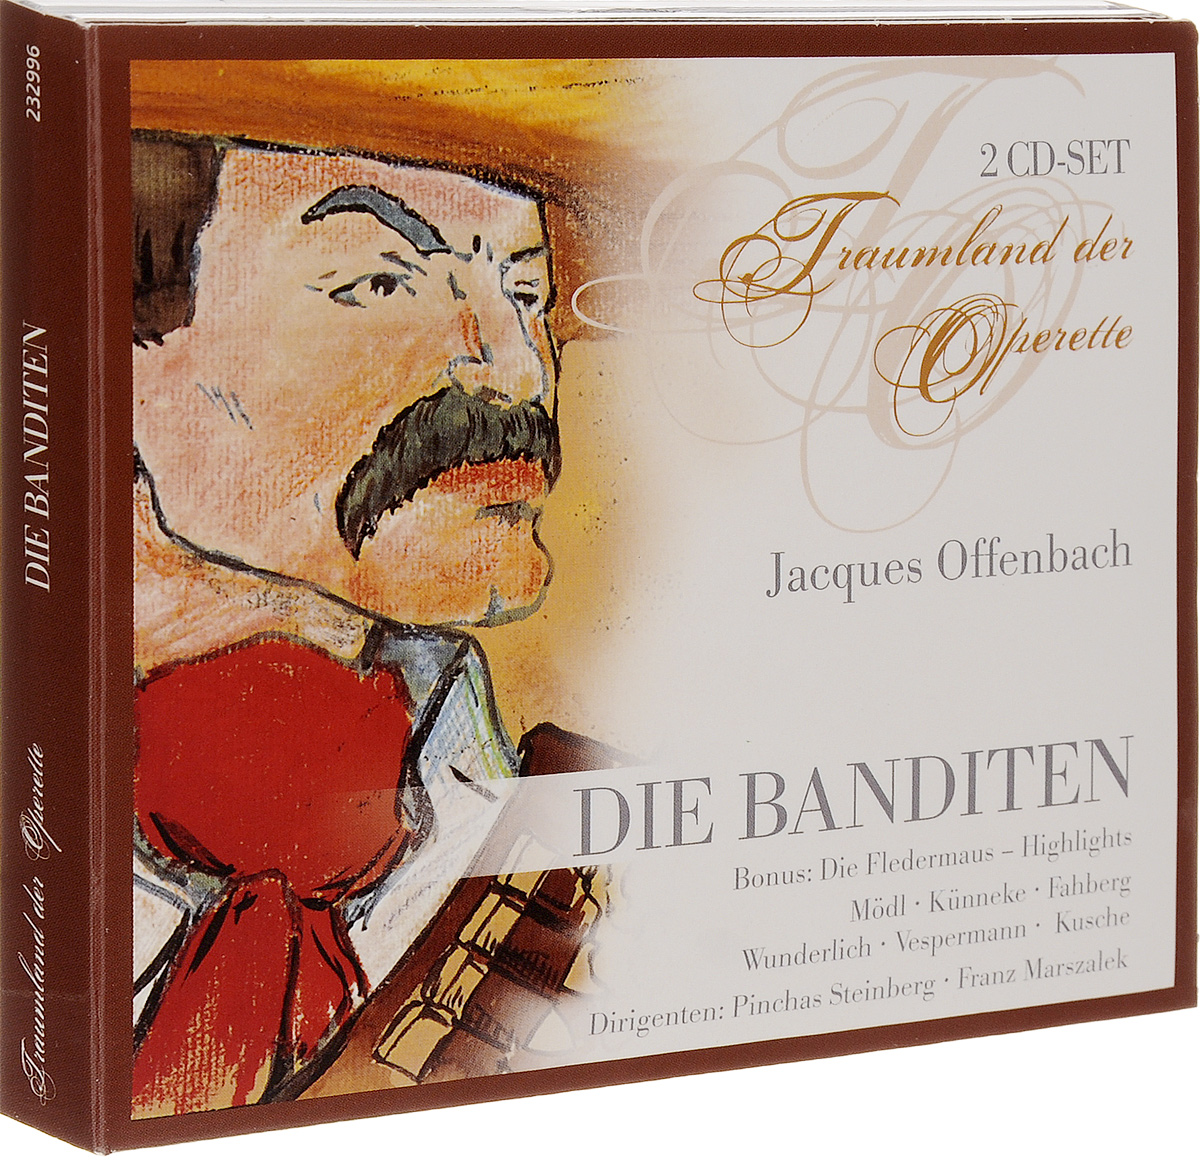 Jacques Offenbach. Die Banditen (2 CD) иоганн штраус паоло россини u offenbach strauss rossini offenbach u v intermezzo